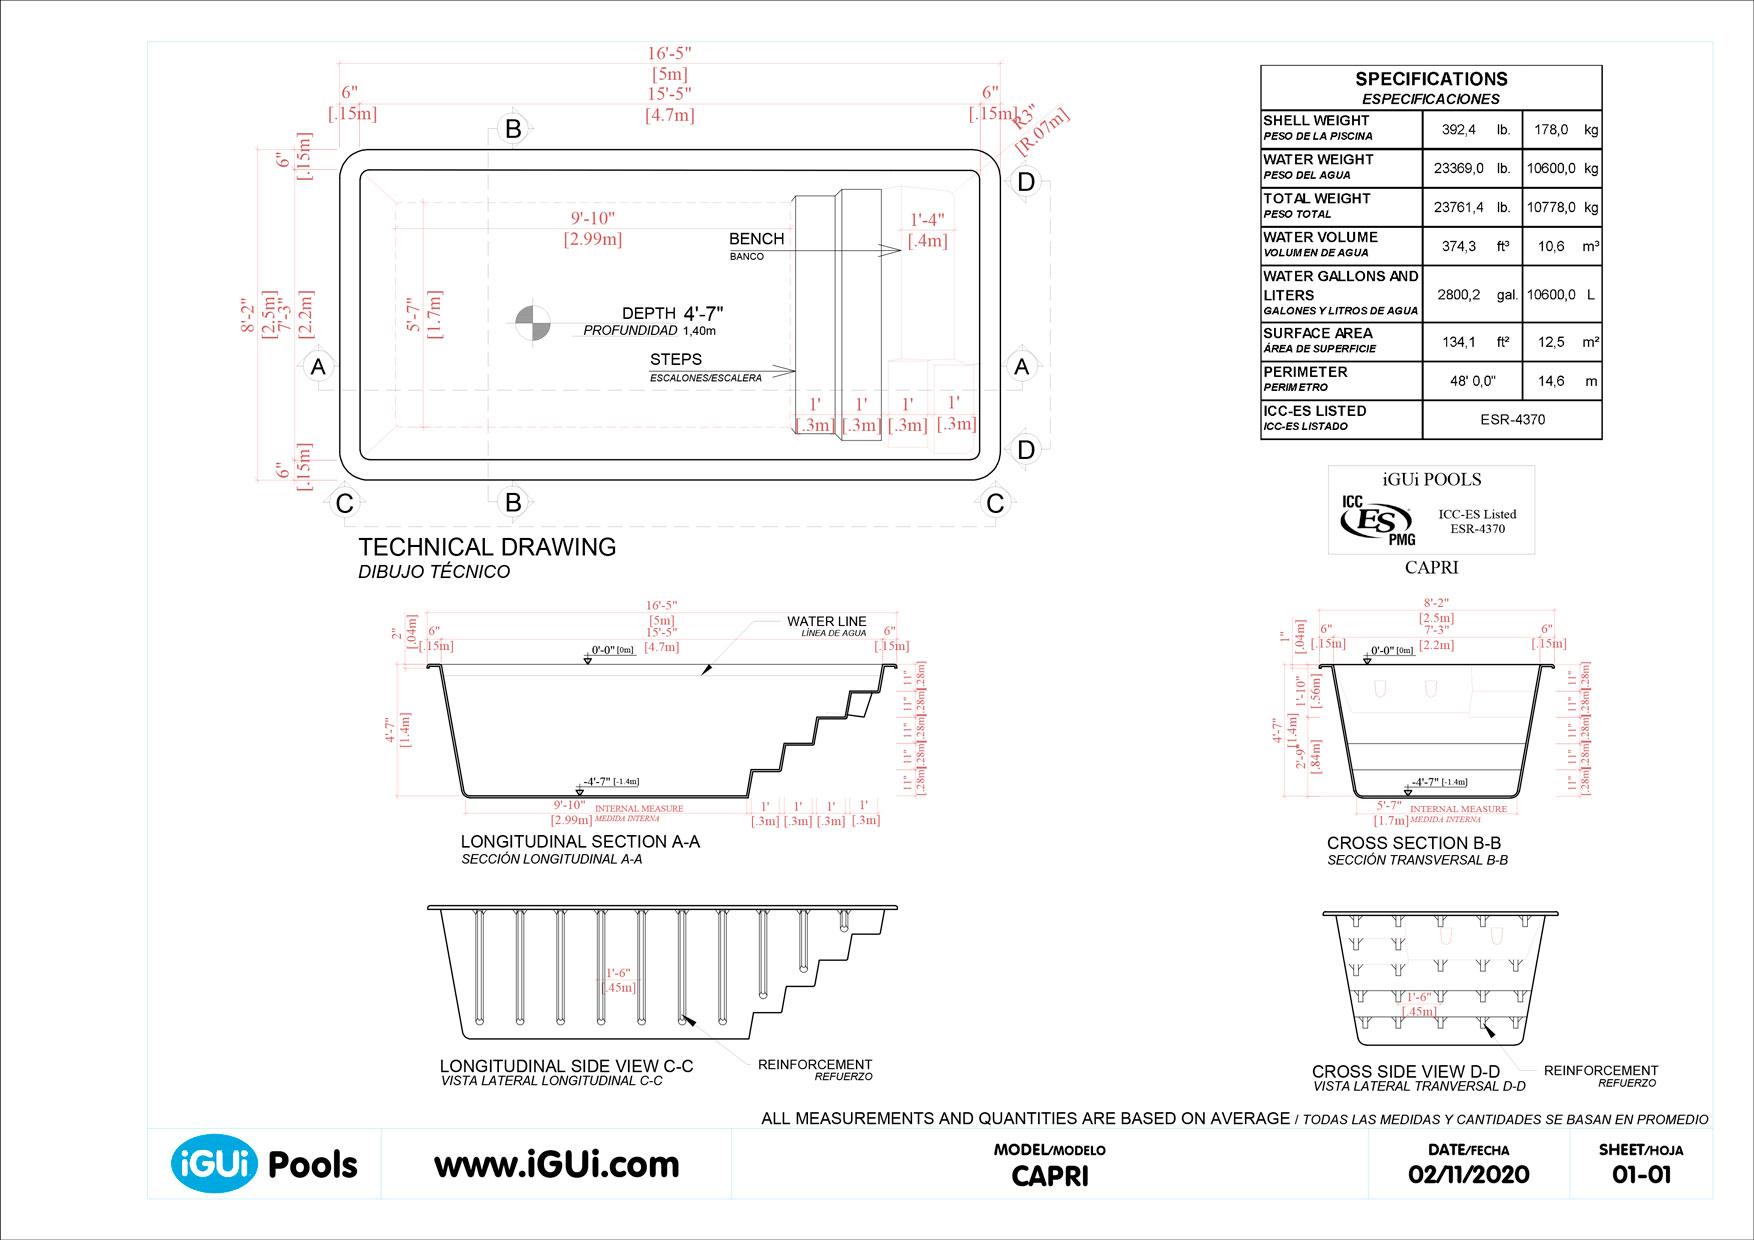 Technical drawing Capri (no scale)